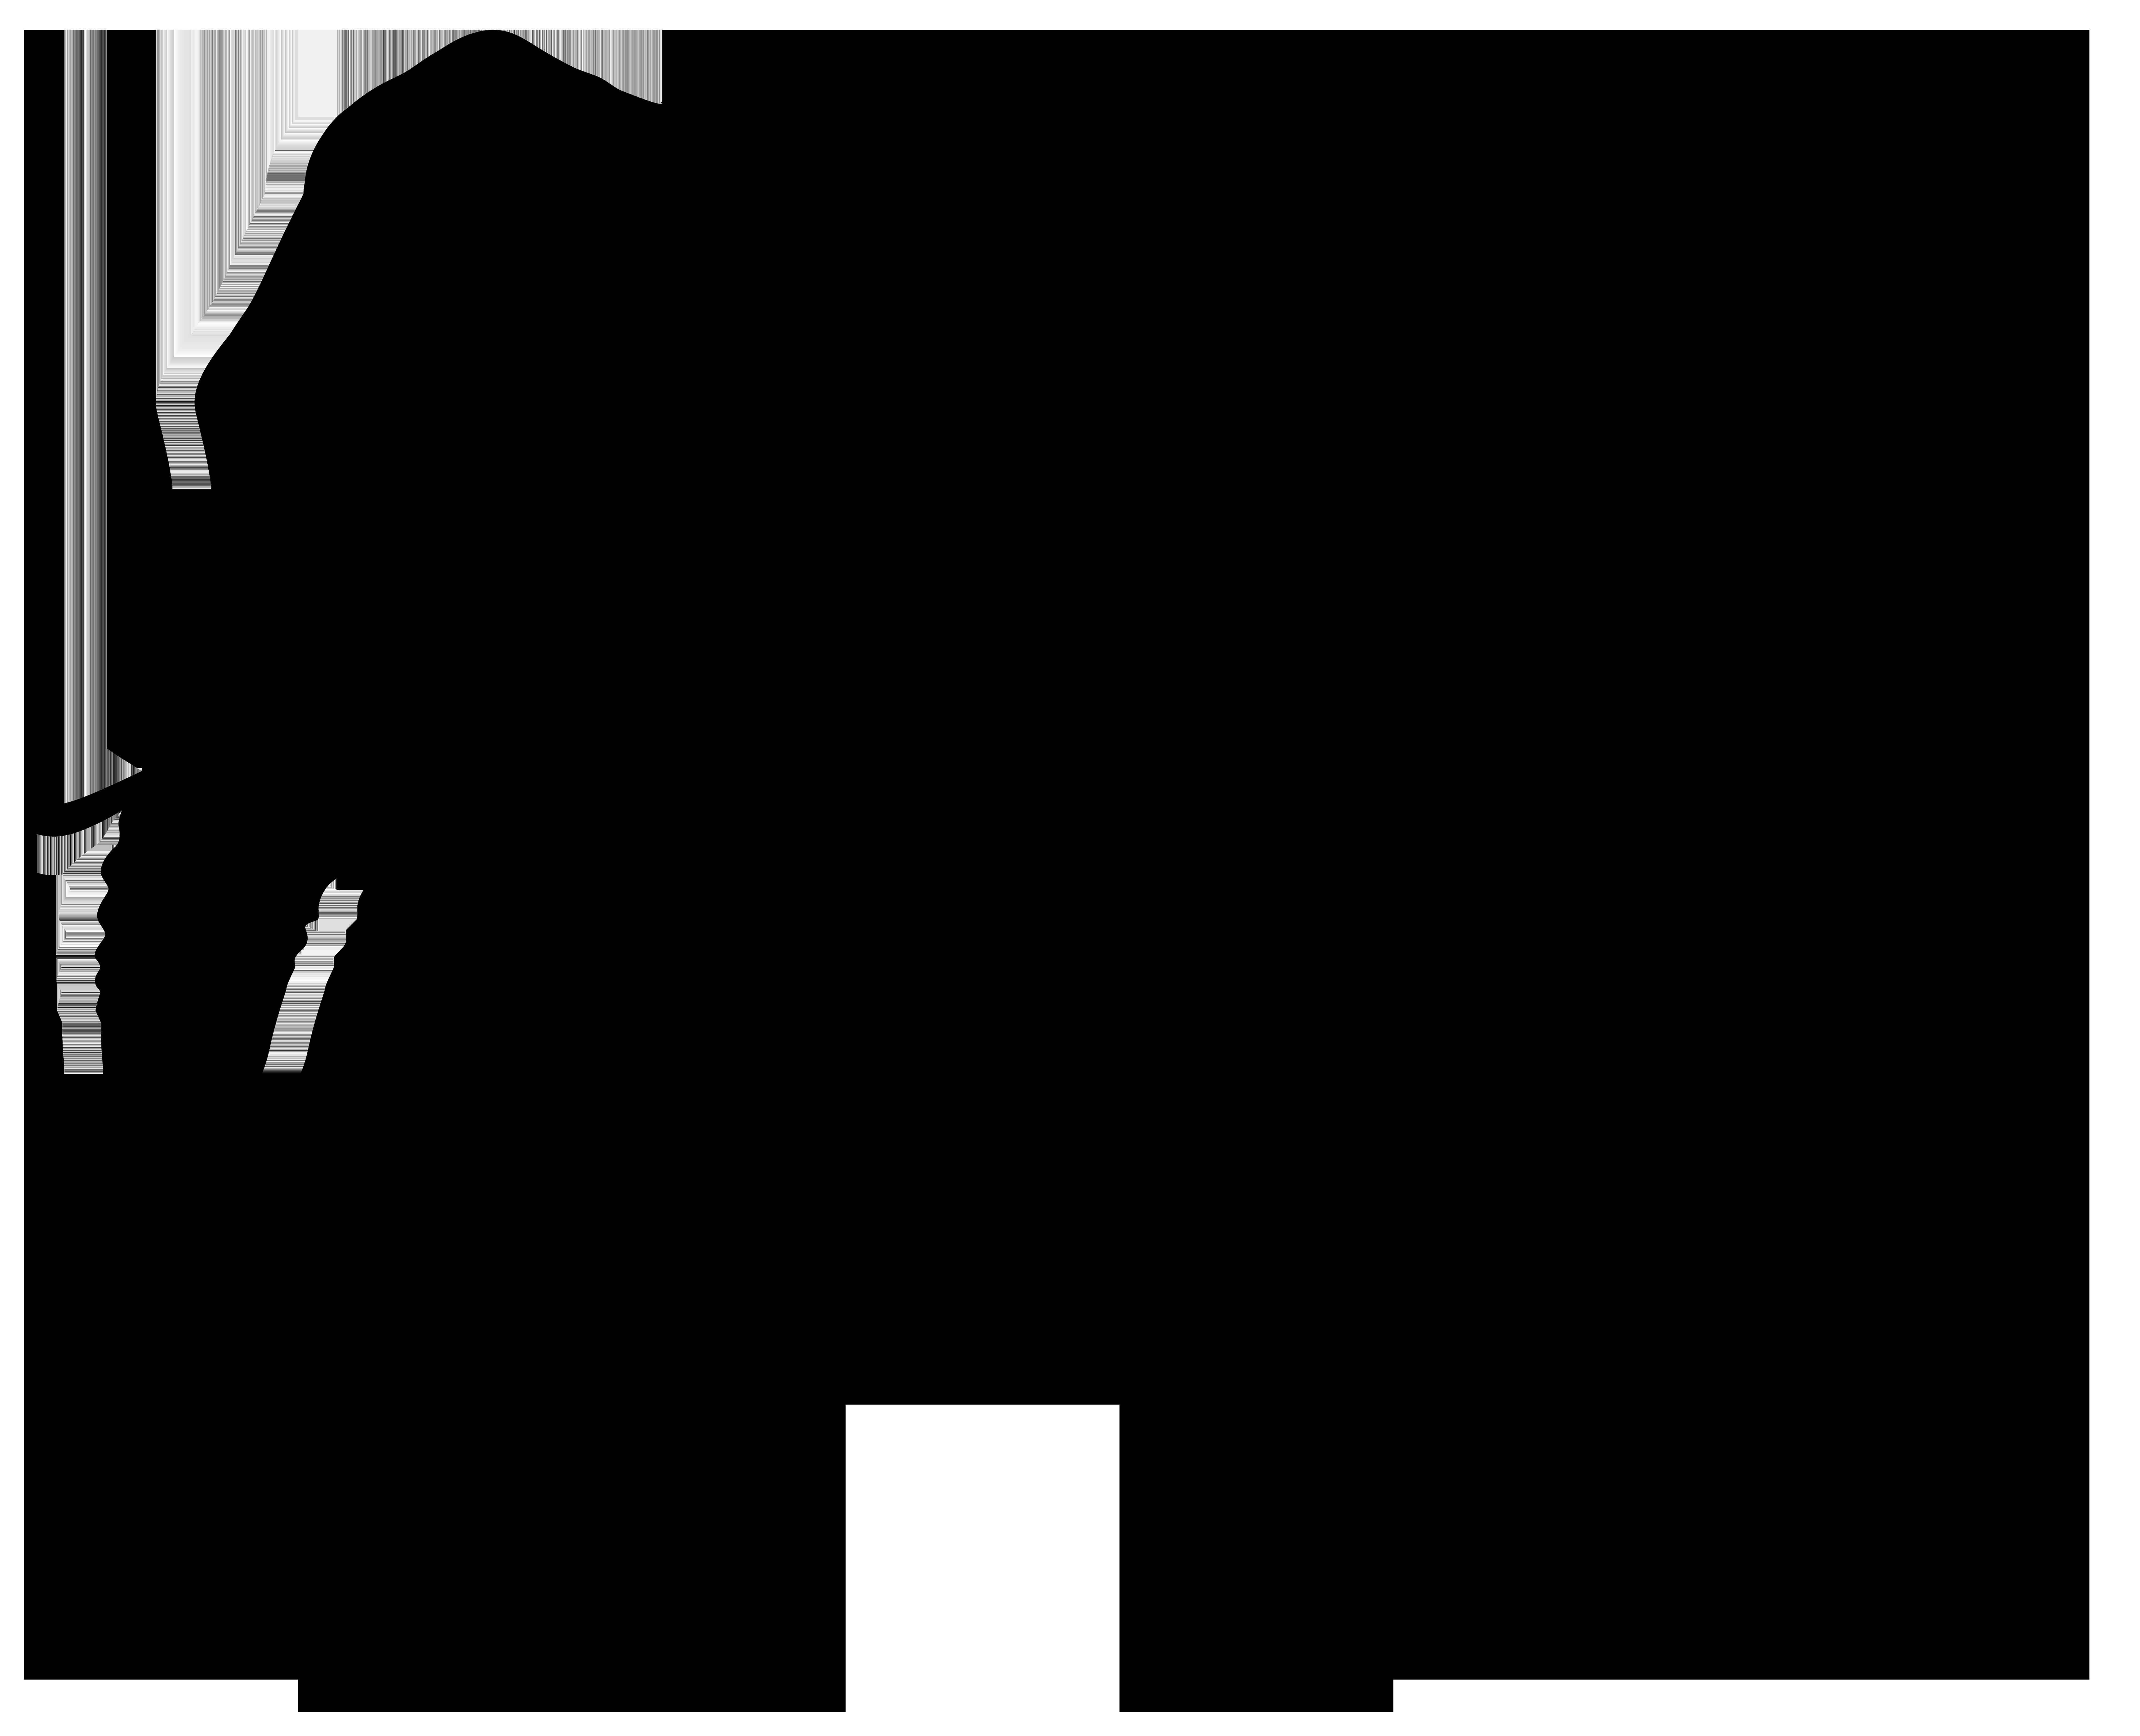 8000x6490 Elephant Silhouette Png Transparent Clip Art Imageu200b Gallery